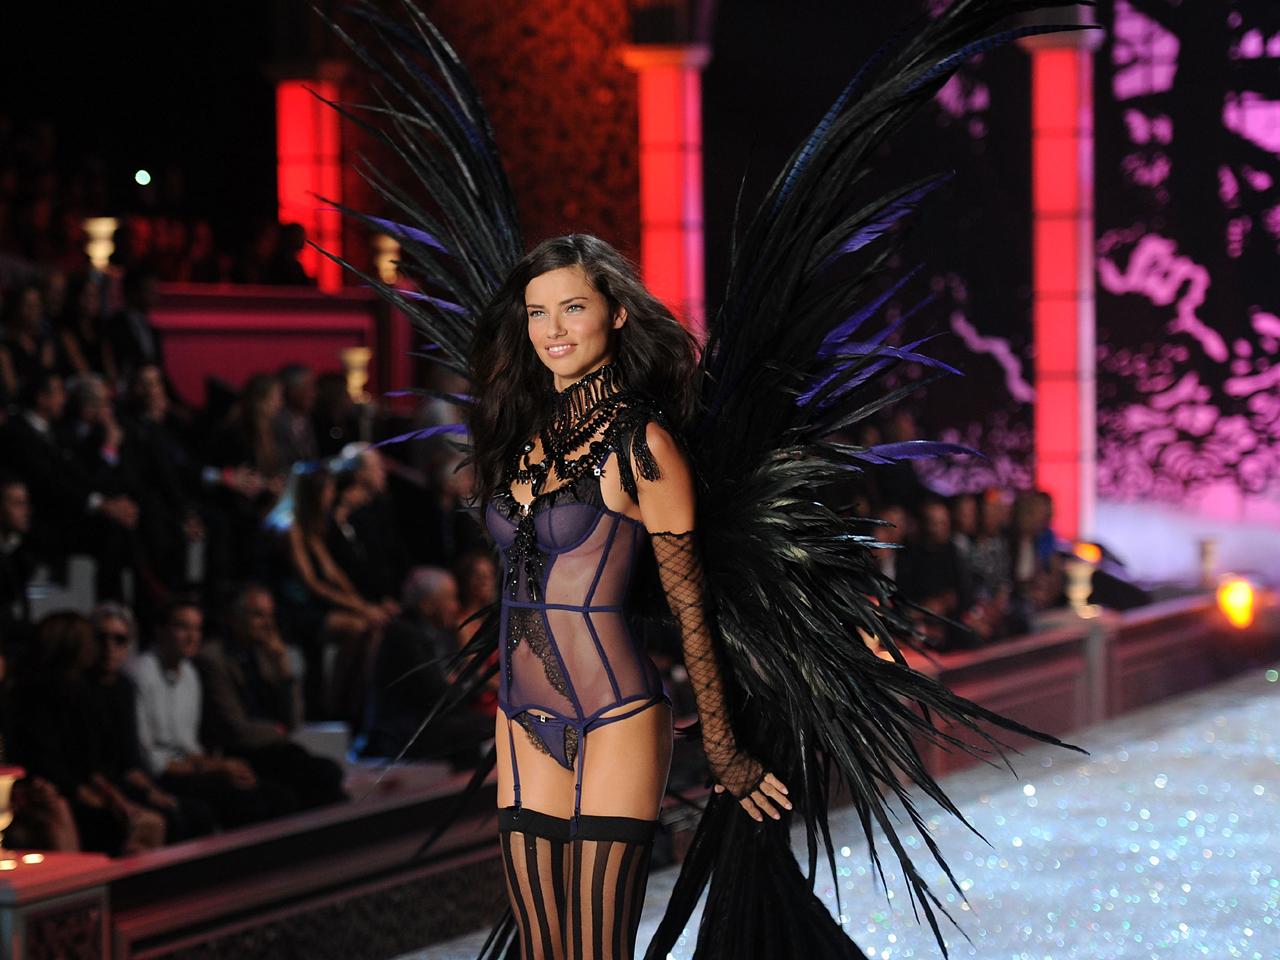 bfdcb6346546b Victoria's Secret Fashion Show: Miranda Kerr, Adriana Lima and other ...